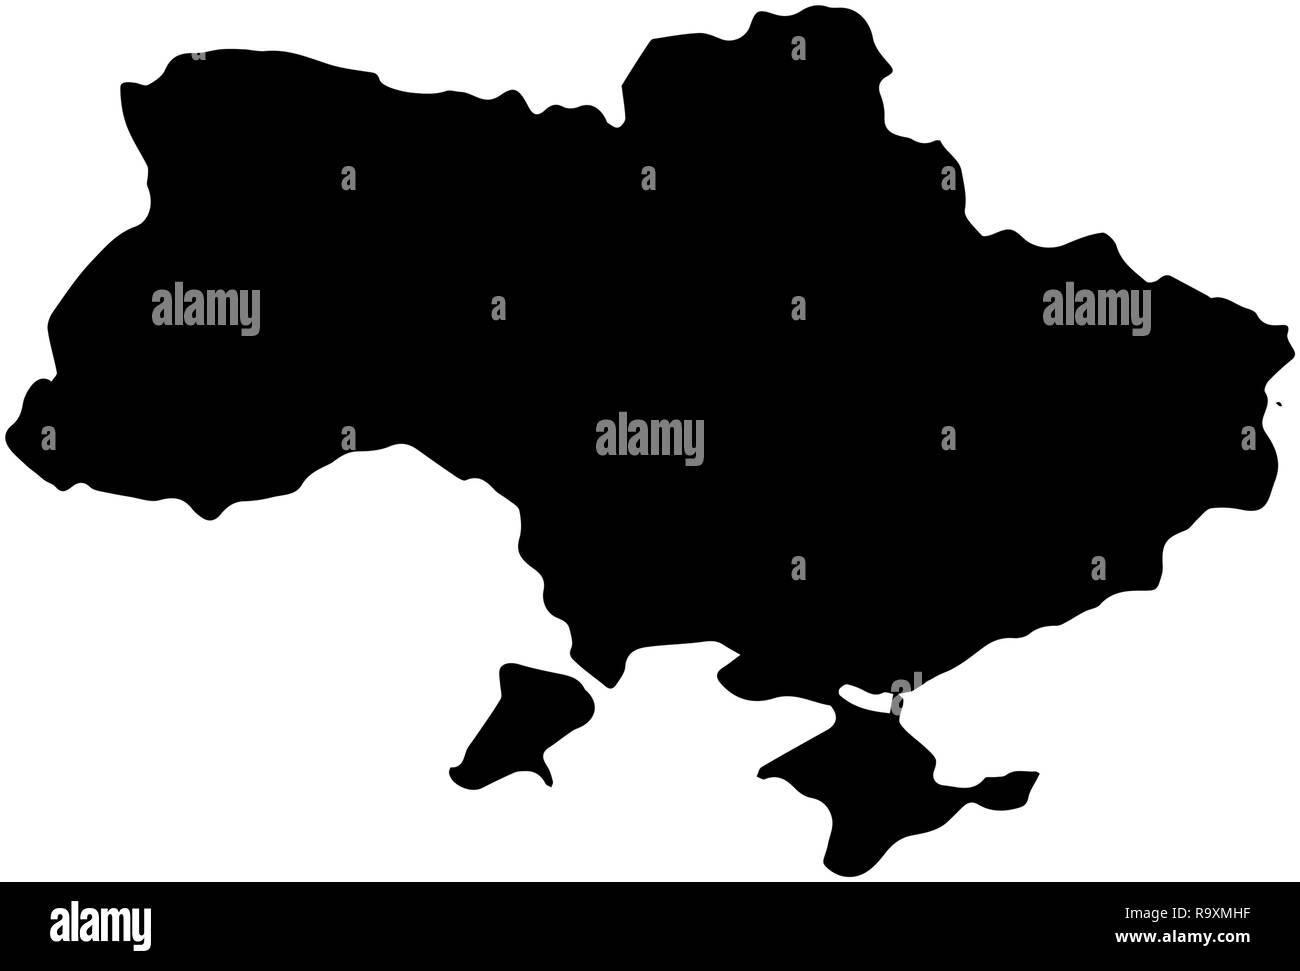 Ukrain Country Map illustration black isolated on white ...